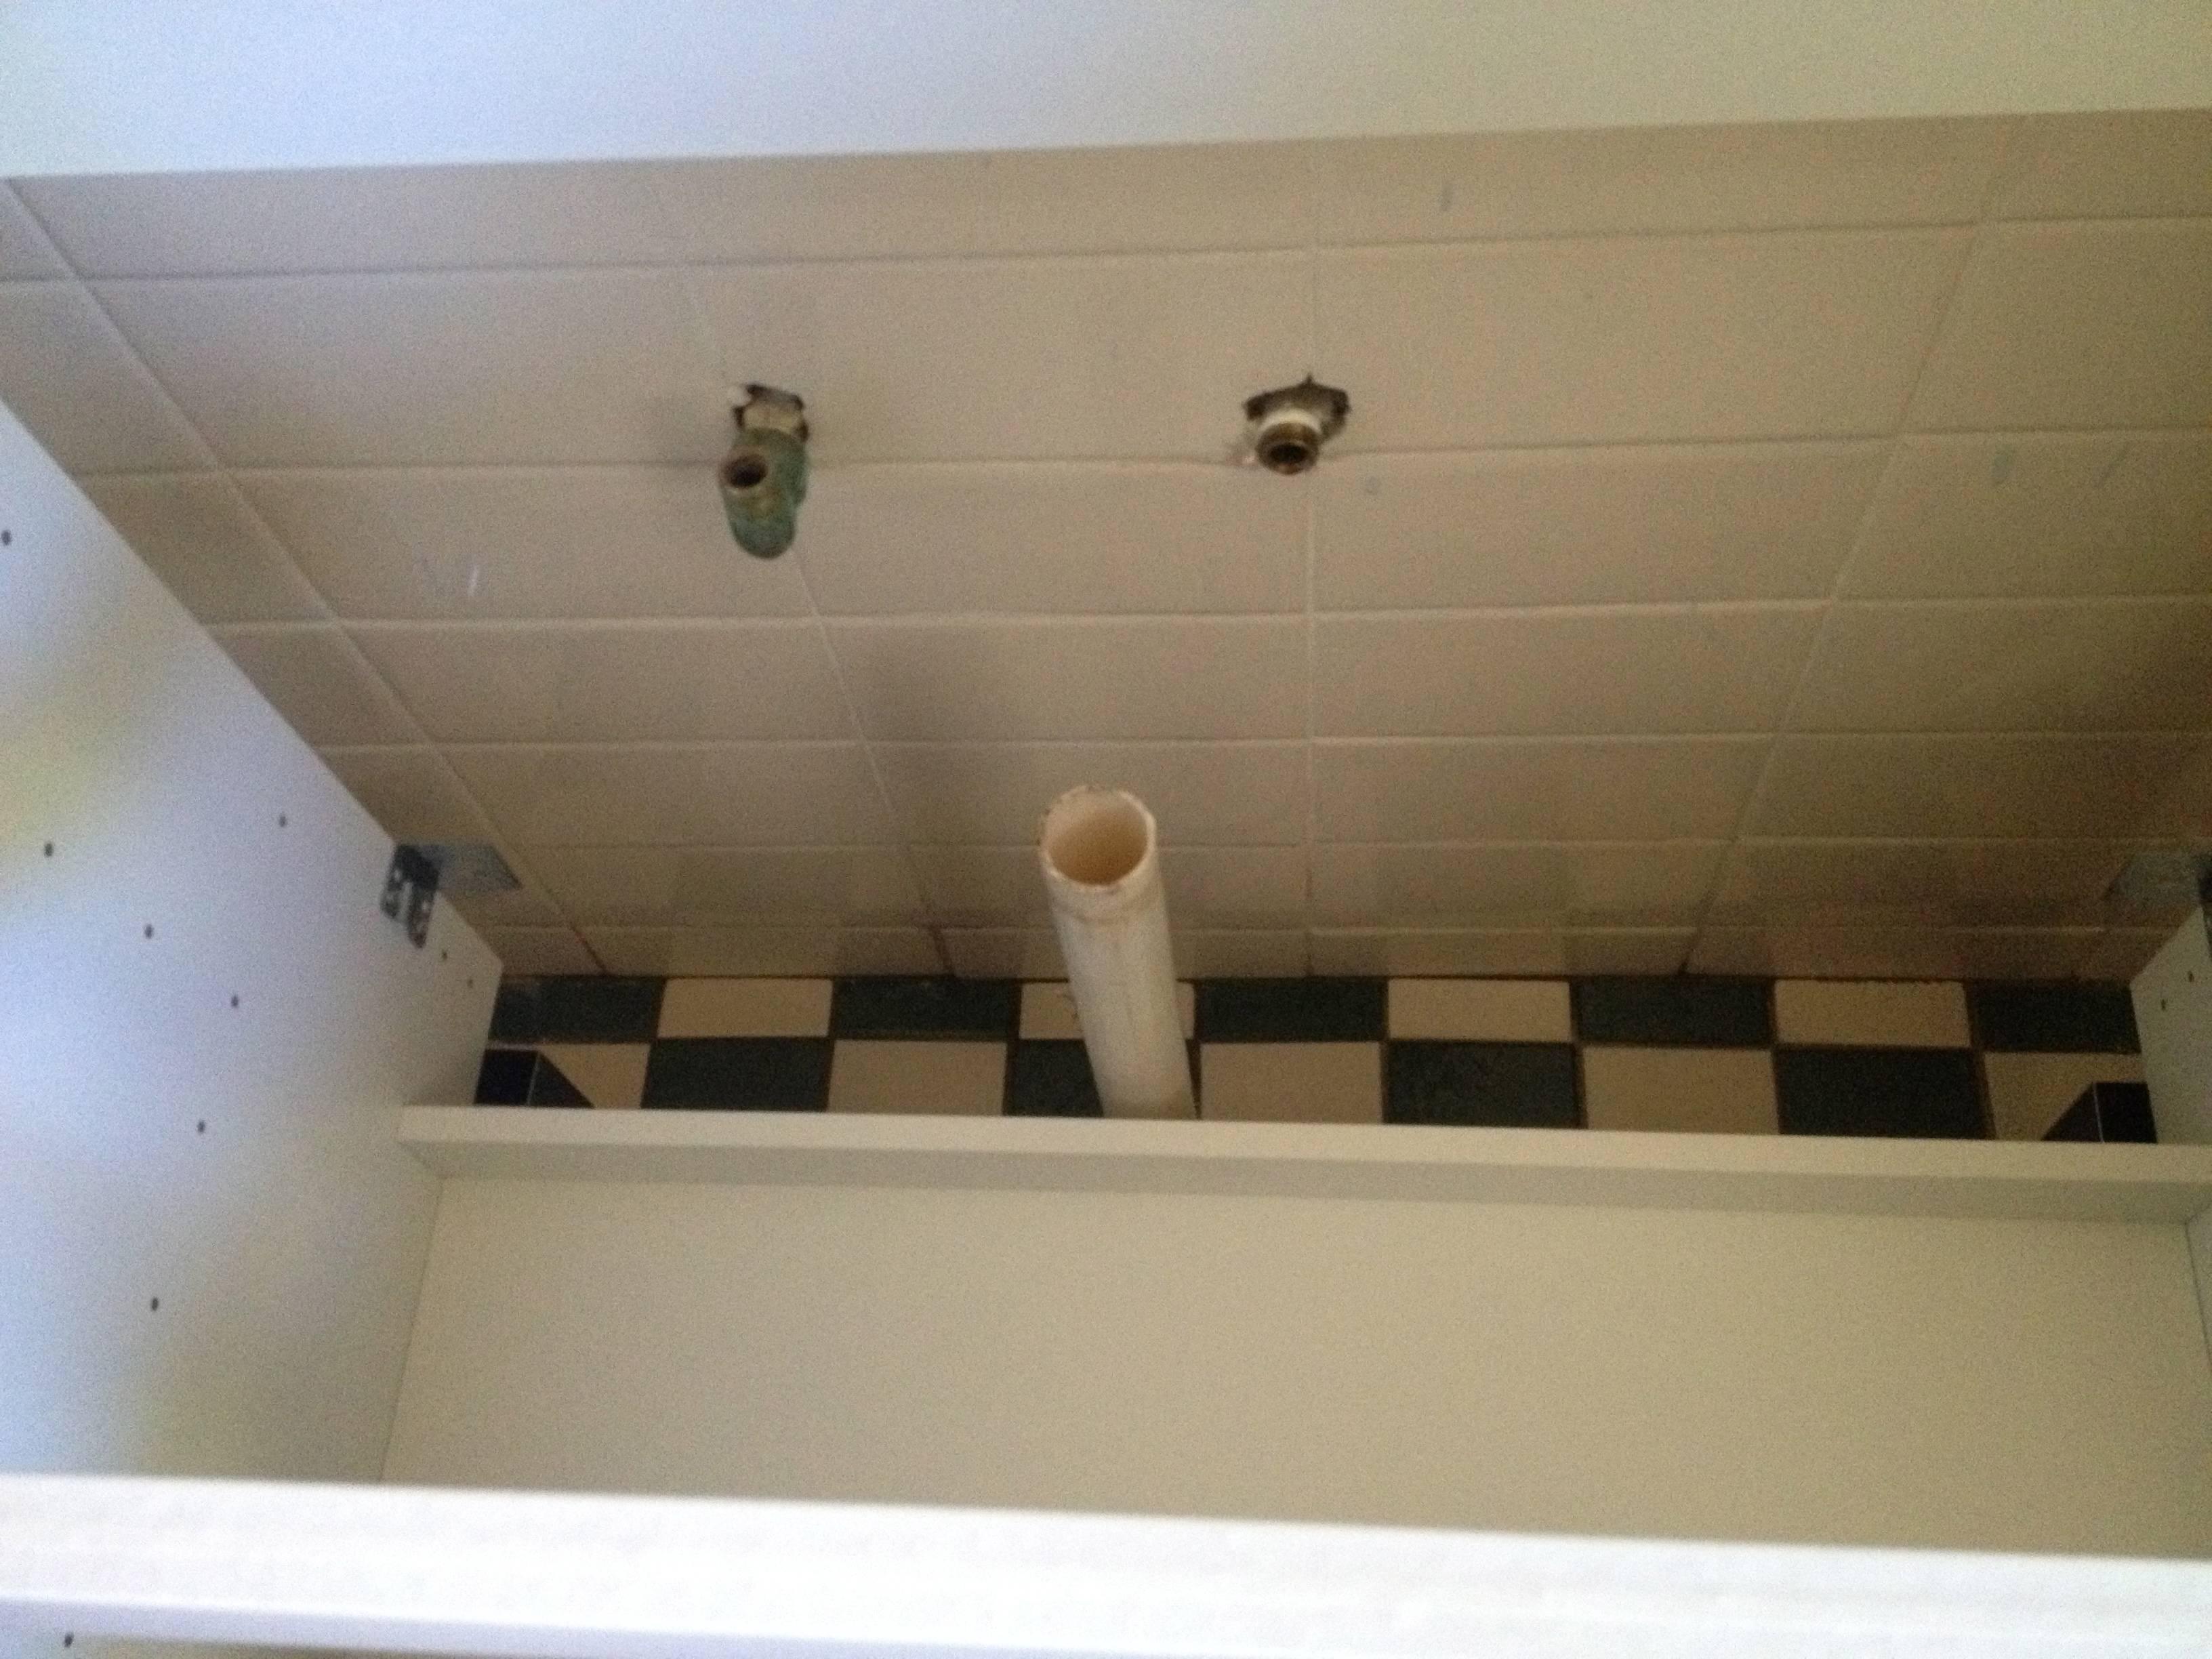 Diagram For Sink Plumbing Floor Plumbing Pipe Too Far Away From The Wall For Vanity